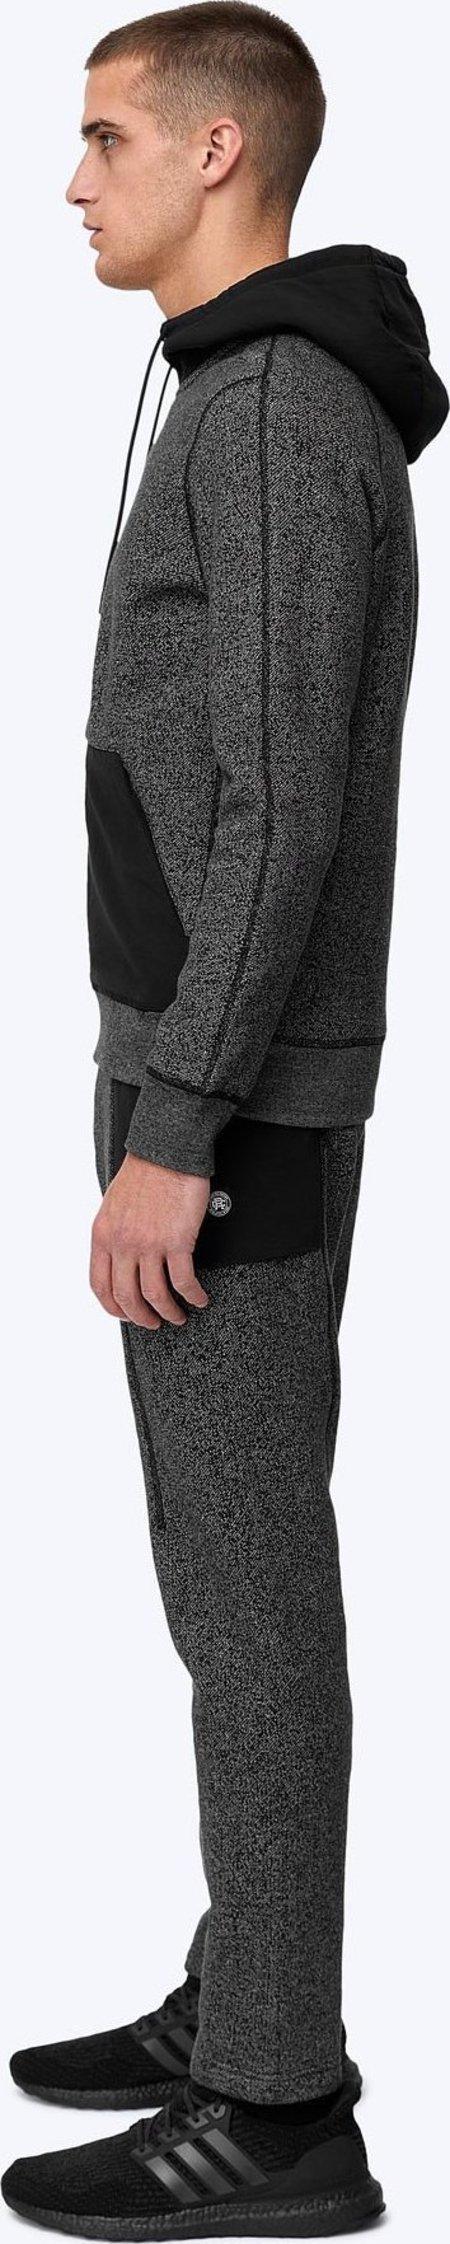 Reigning Champ tiger fleece hoodie - black